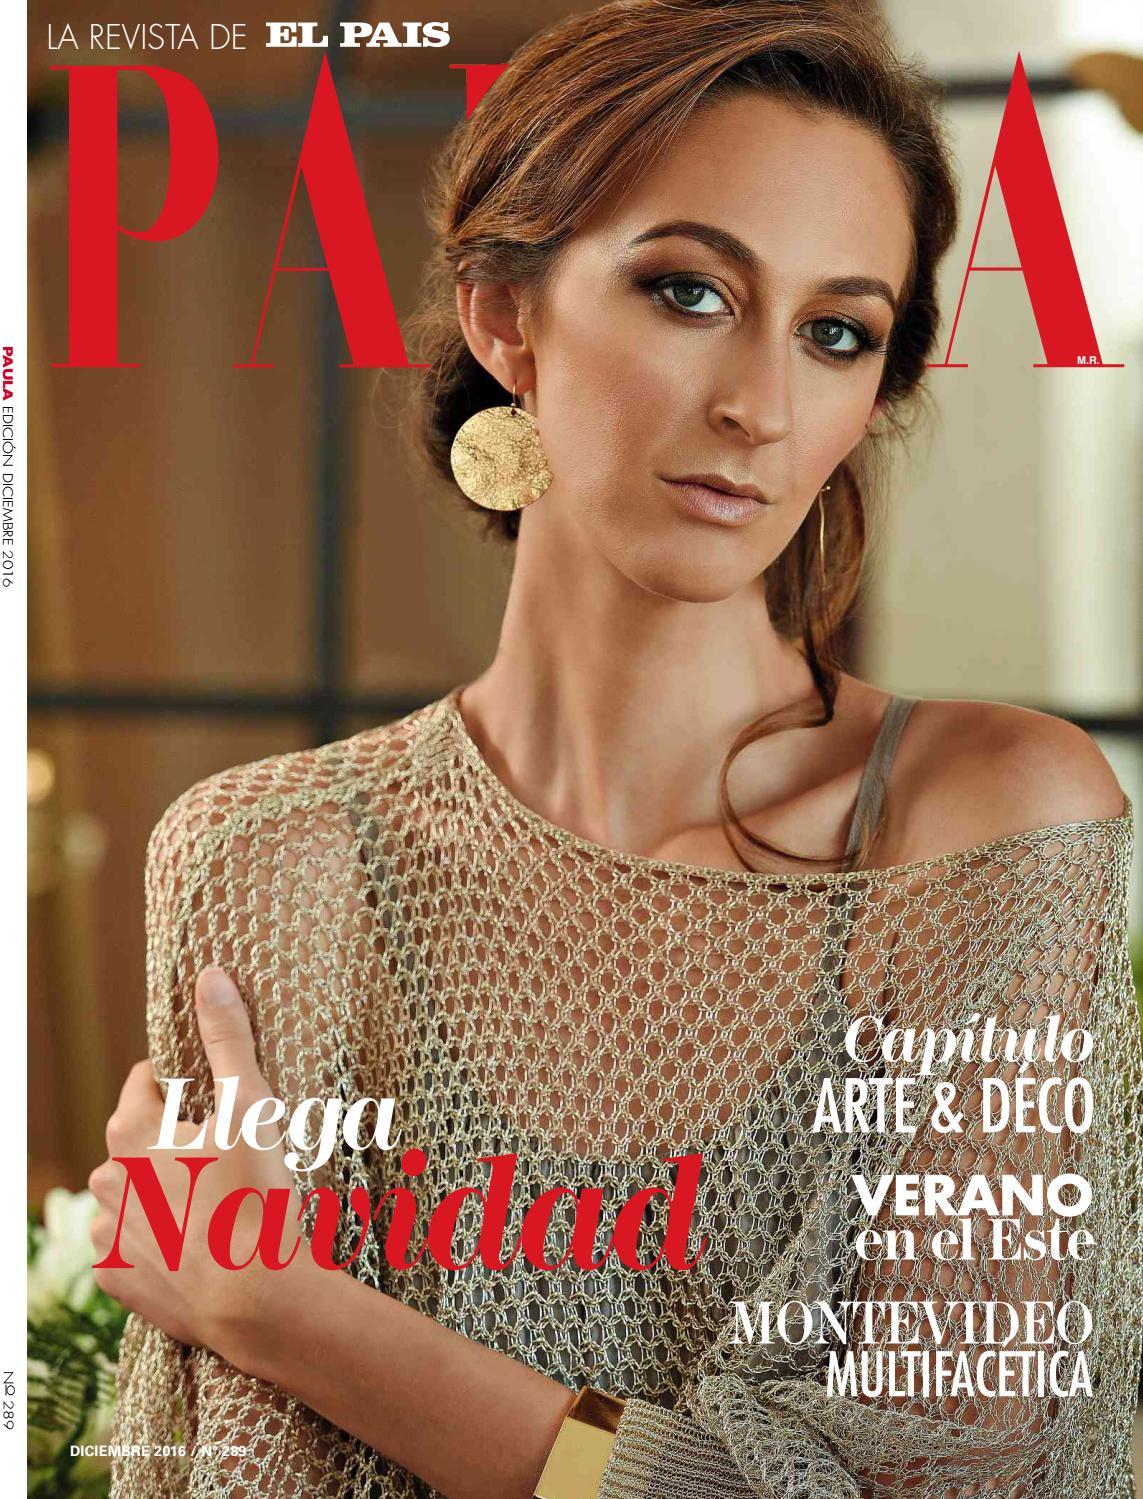 Revista Paula Diciembre 2016 by Revista Paula - issuu 9540ee70694